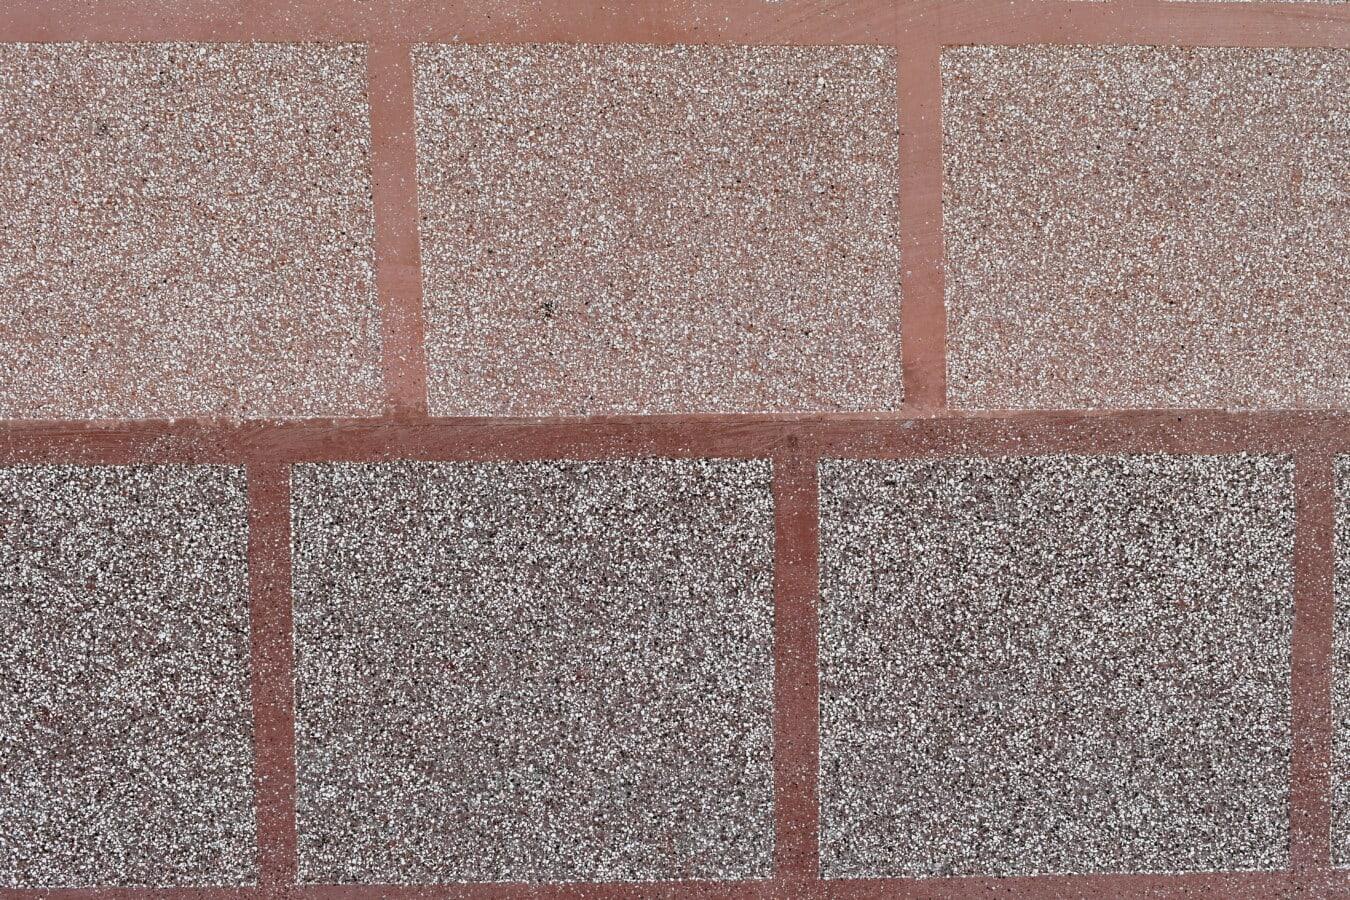 Wand, Platz, Textur, Muster, Würfel, rötlich, Material, Zement, Stein, rau